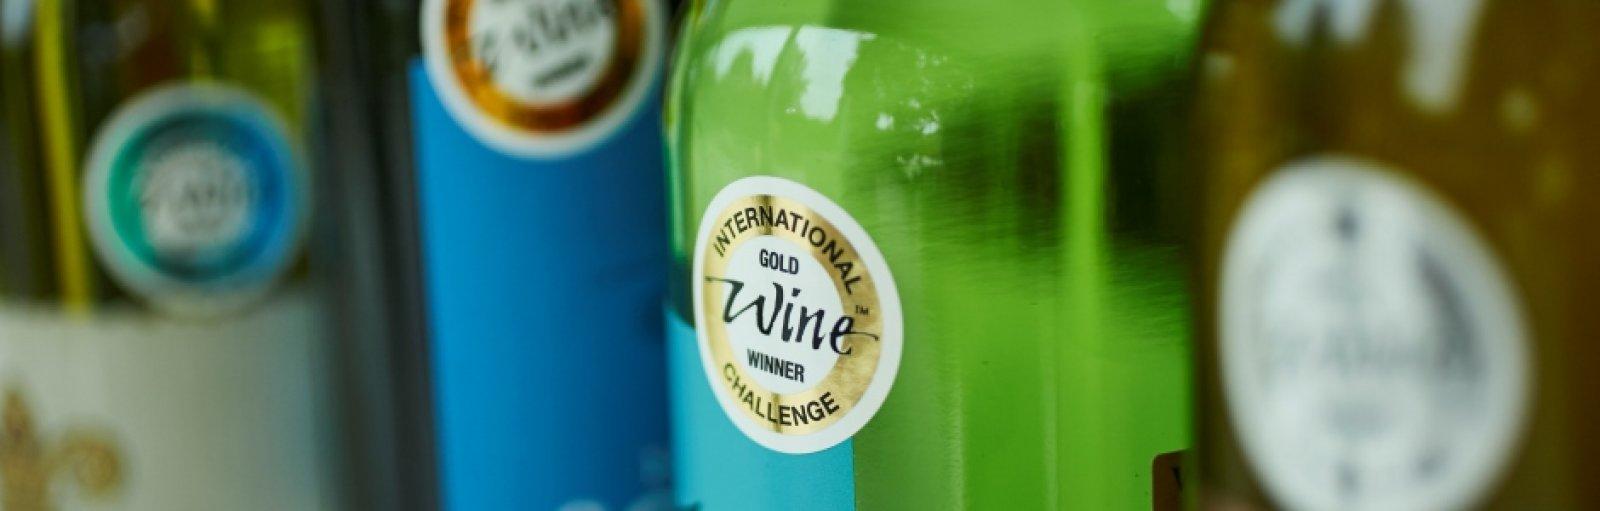 Internacional Wine Challenge